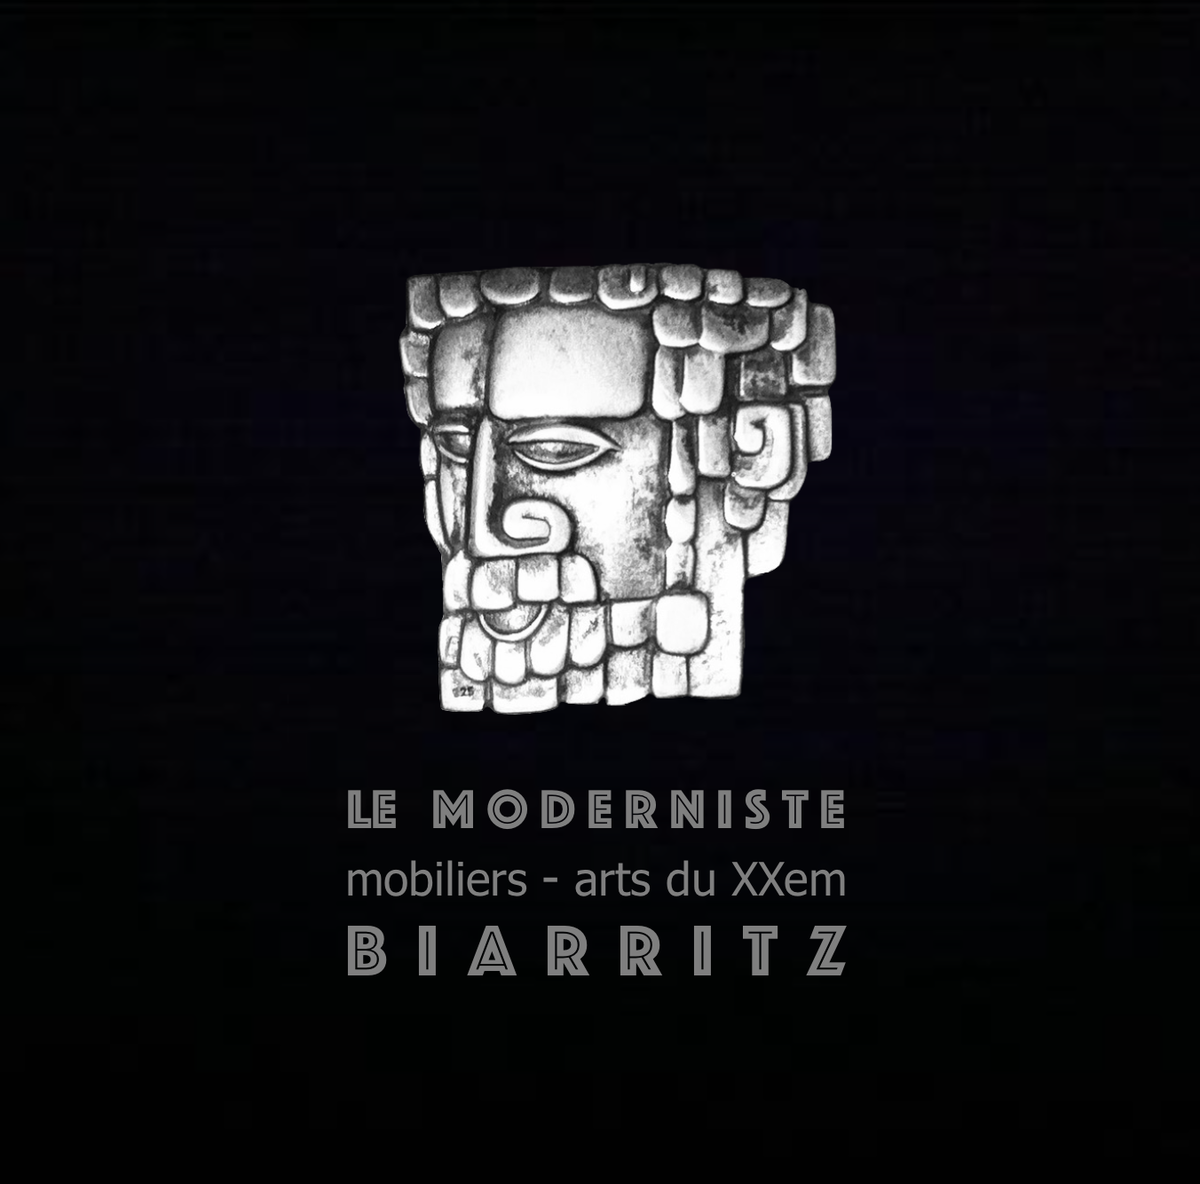 moderniste